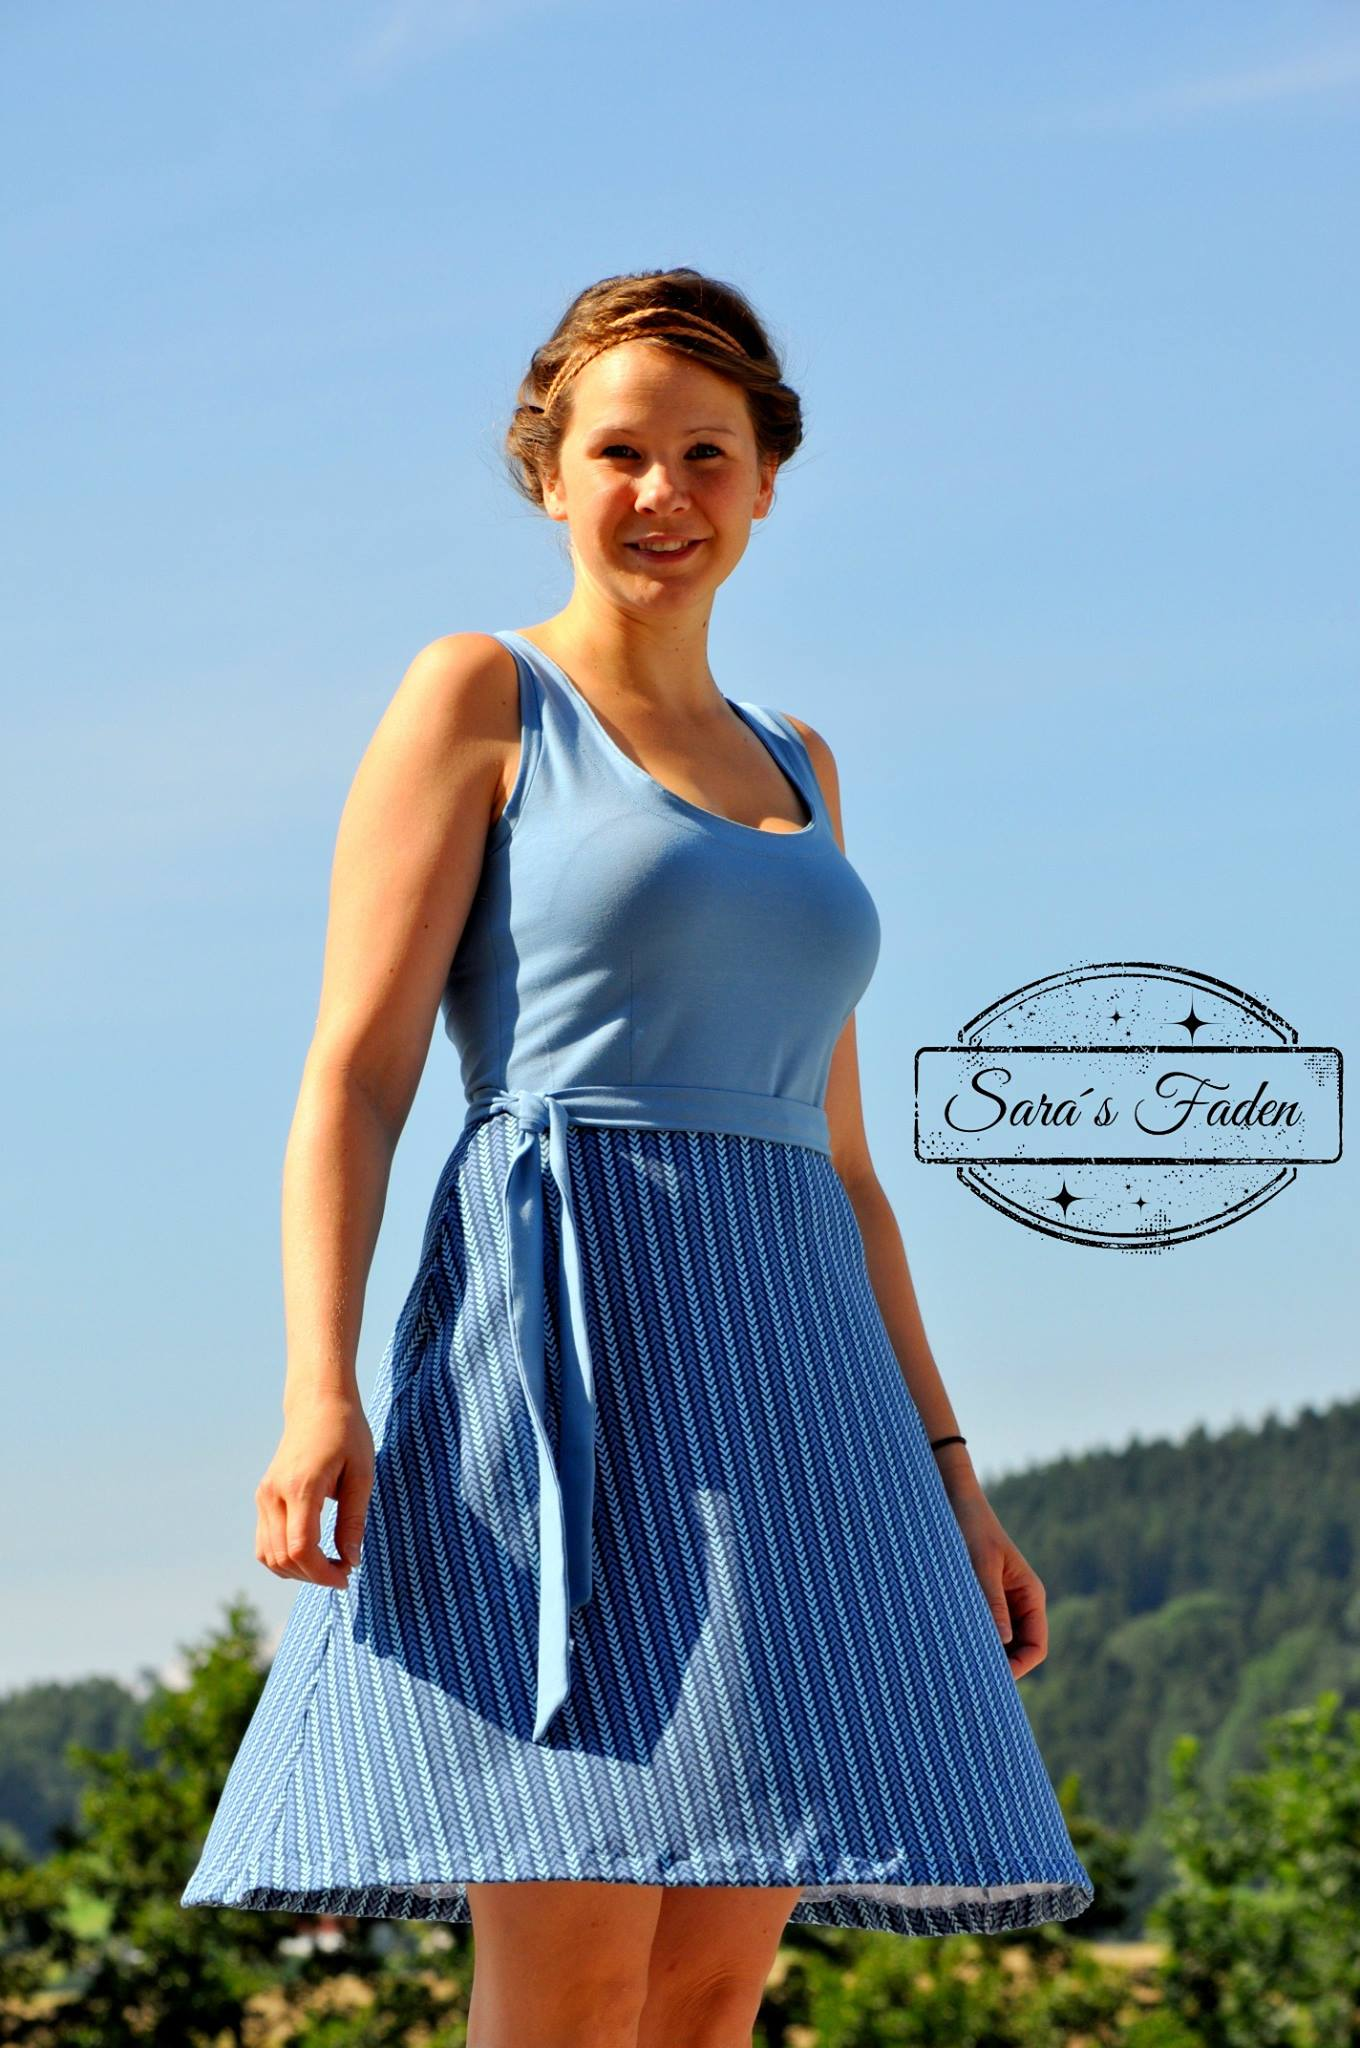 Nuria-Jerseykleid-farbenmix-bienvenido-colorido_Ebook-Kleid_Schnittmuster-blaues-Damenkleid